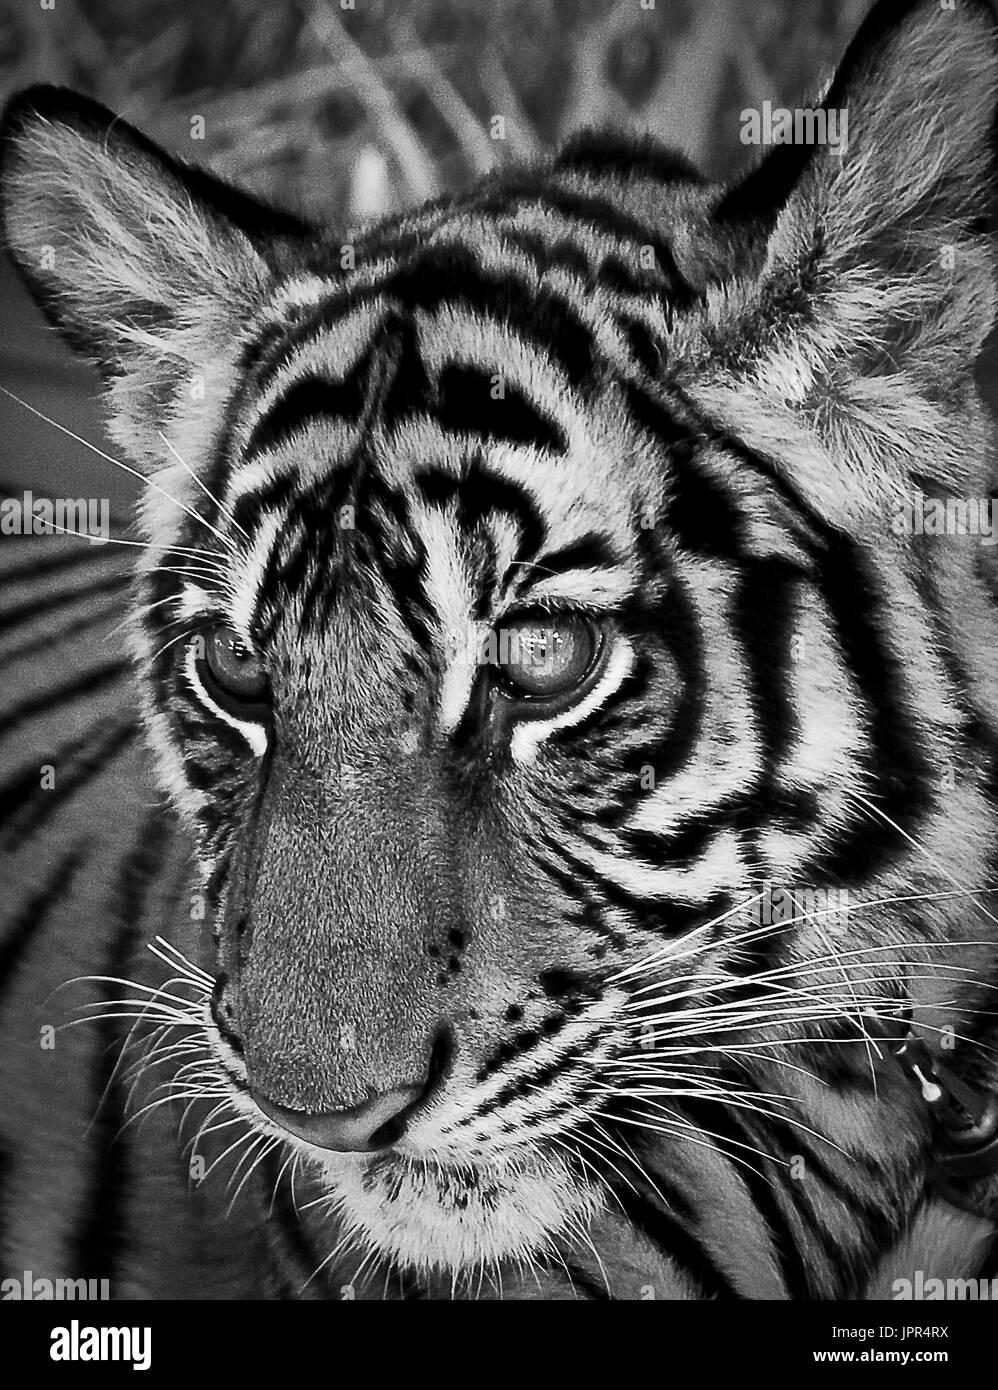 tiger - Stock Image